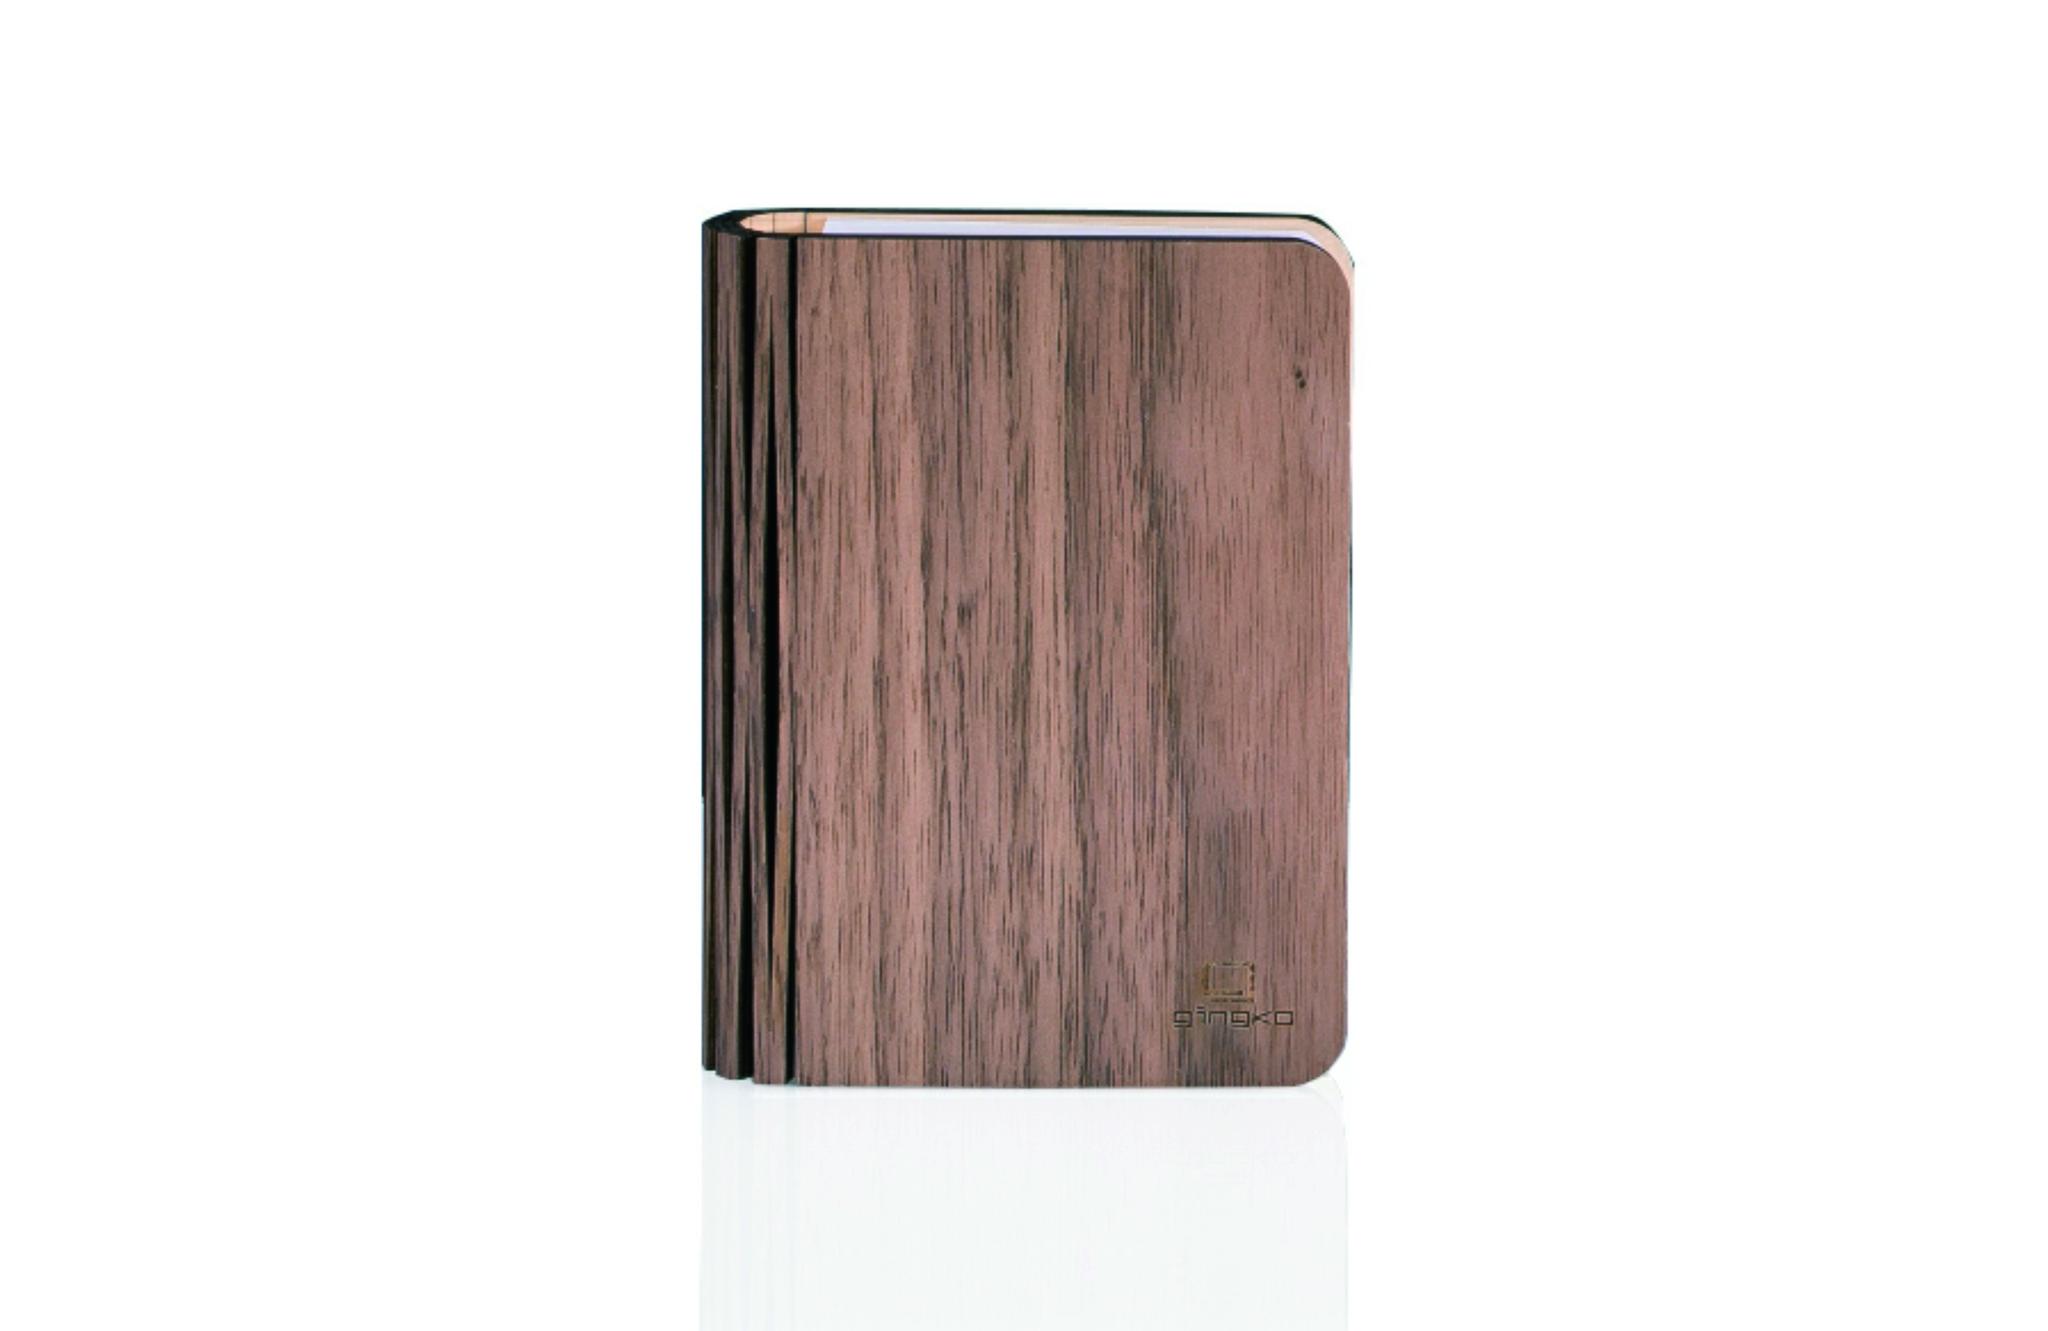 Wood walnut klein, inkl. USB Ladekabel, warmes Lic